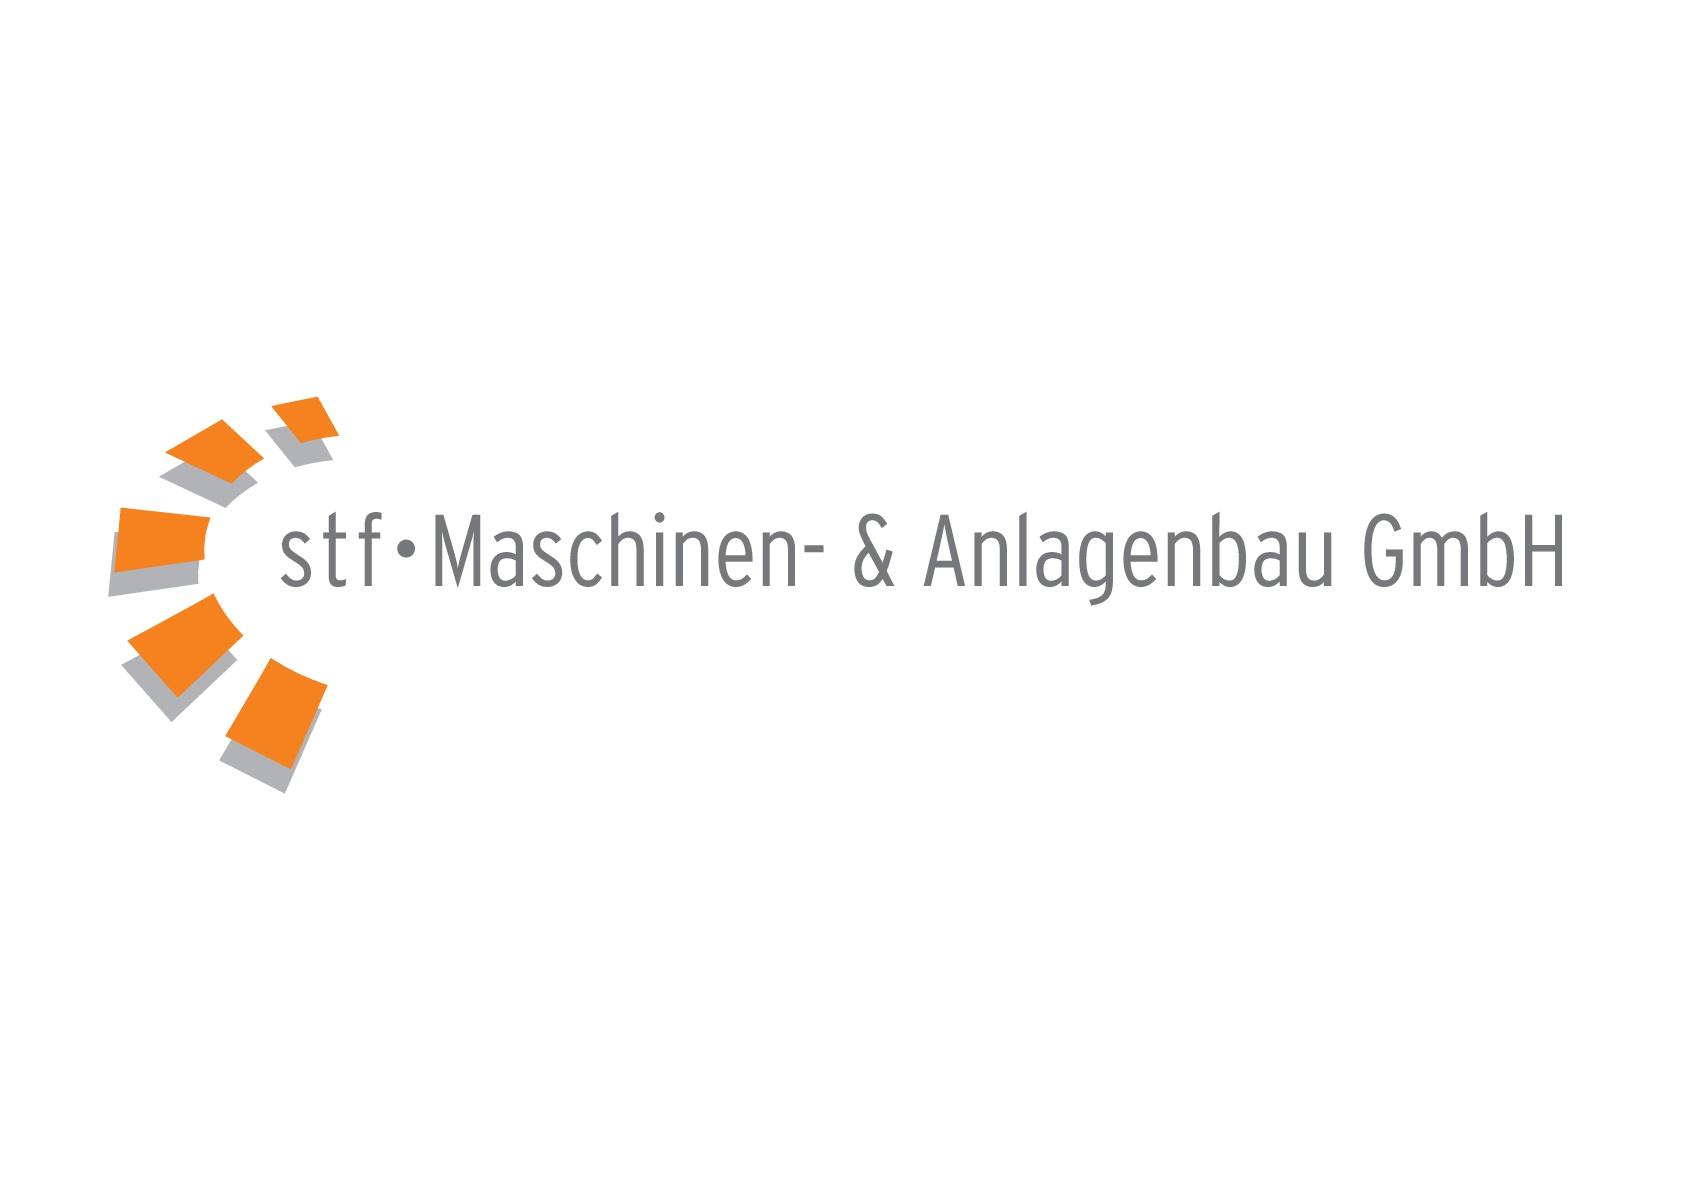 STF Maschinen- & Anlagenbau GmbH